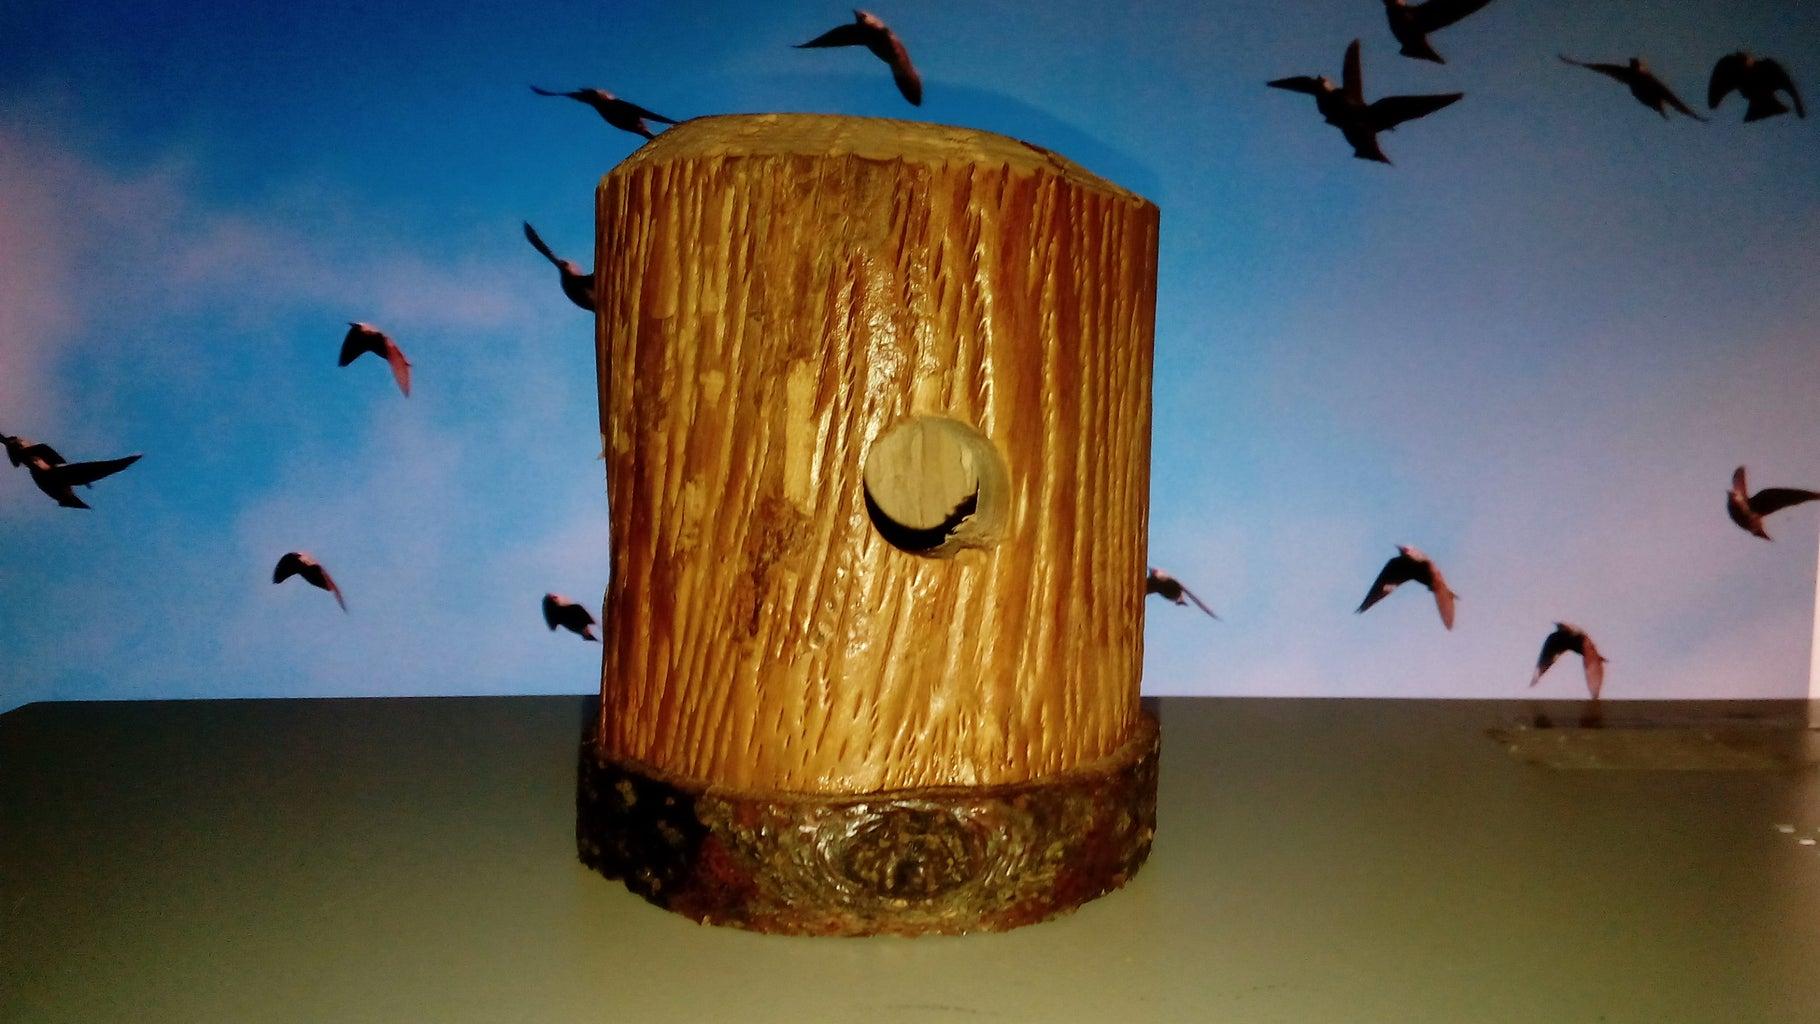 The Log Birdhouse